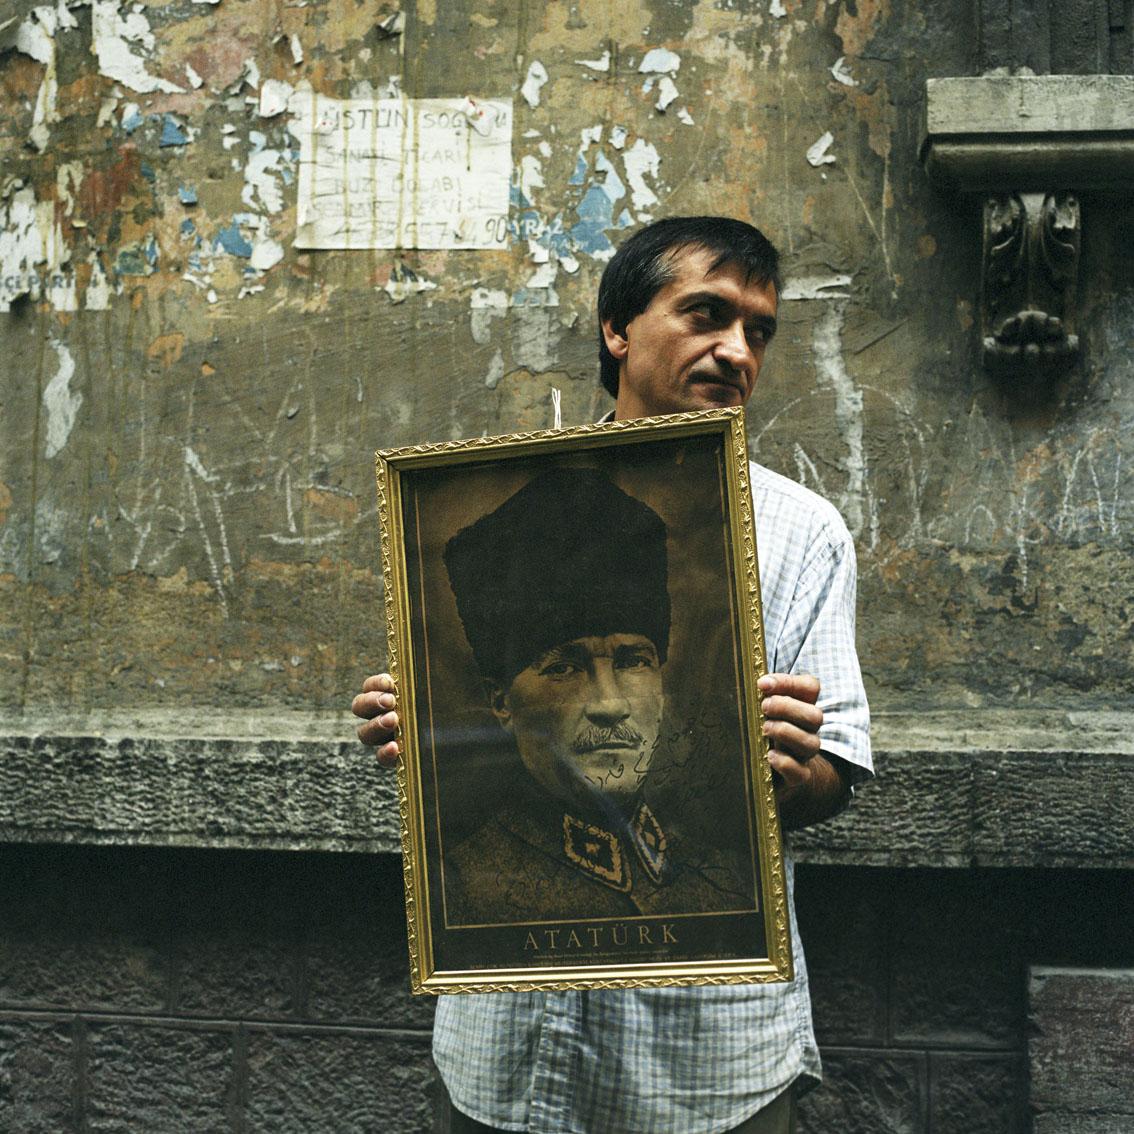 Antiques dealer in Istanbul, Turkey